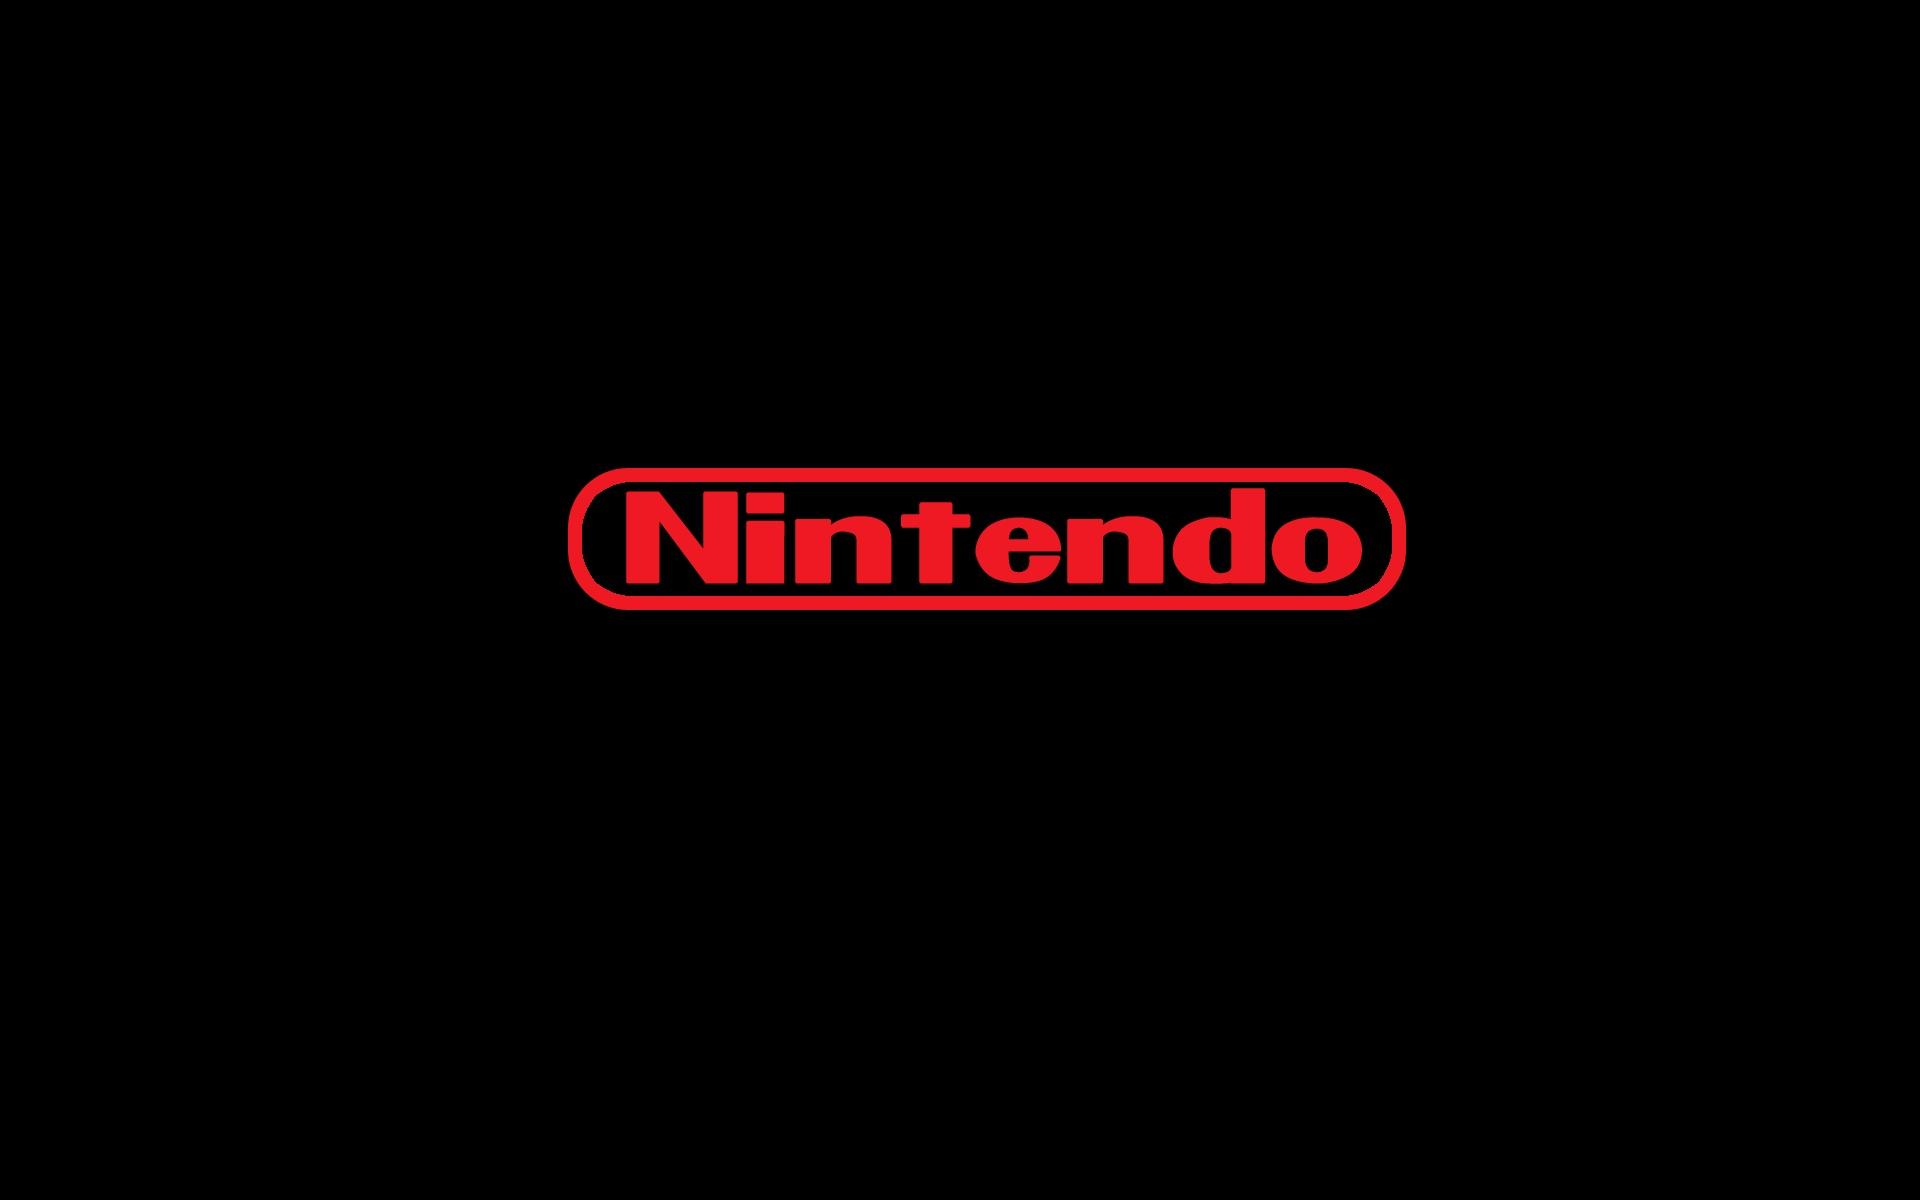 Nintendo Logo Wallpaper Page 1